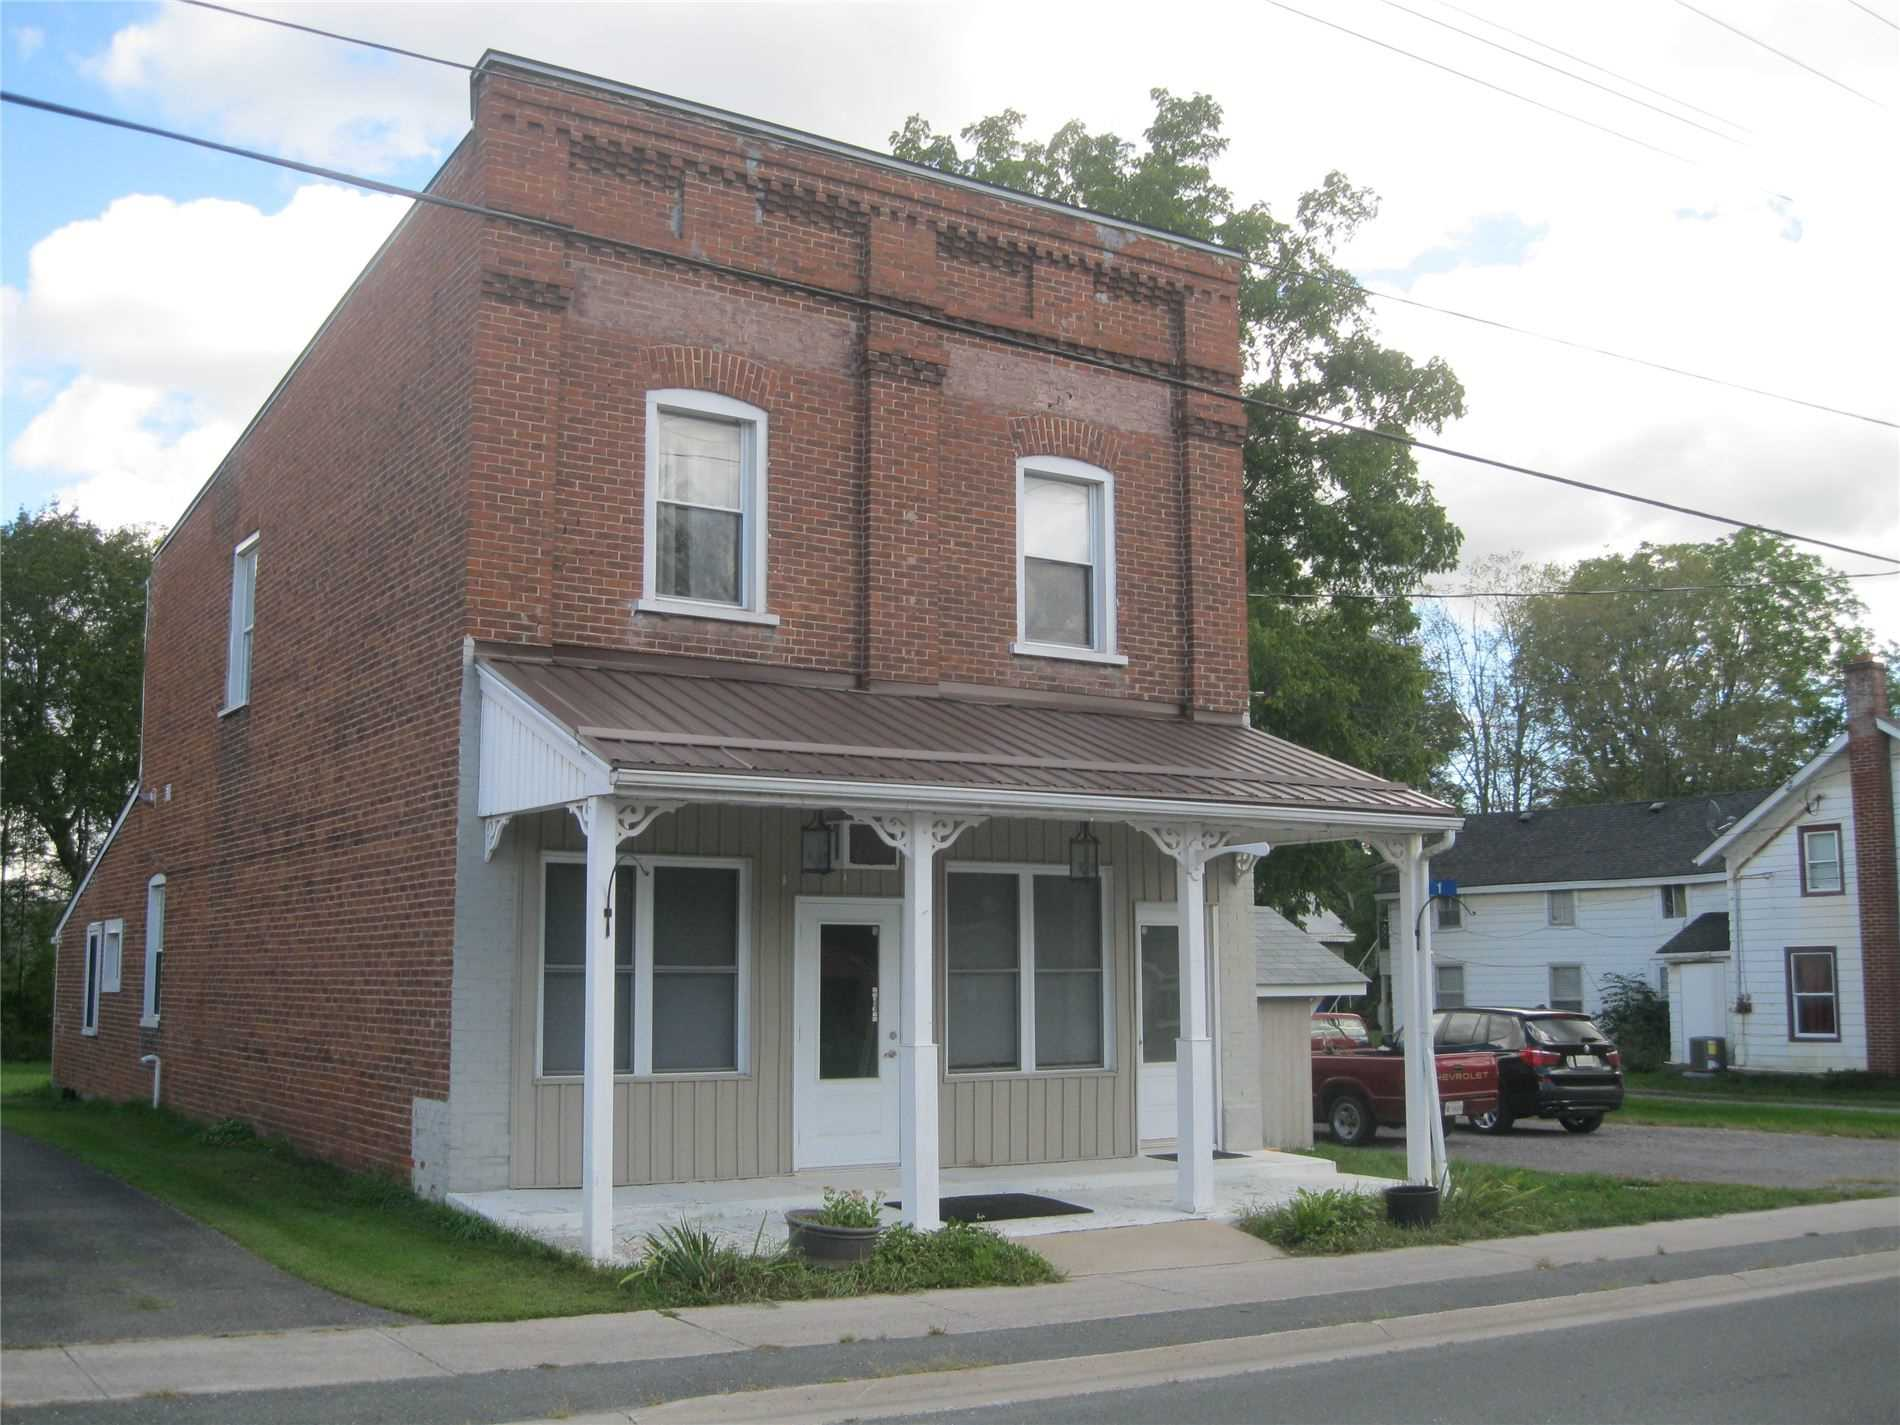 1 County Road 5, Quinte West, Ontario K0K 3M0, 3 Bedrooms Bedrooms, ,3 BathroomsBathrooms,Detached,For Sale,County Road 5,X5371917